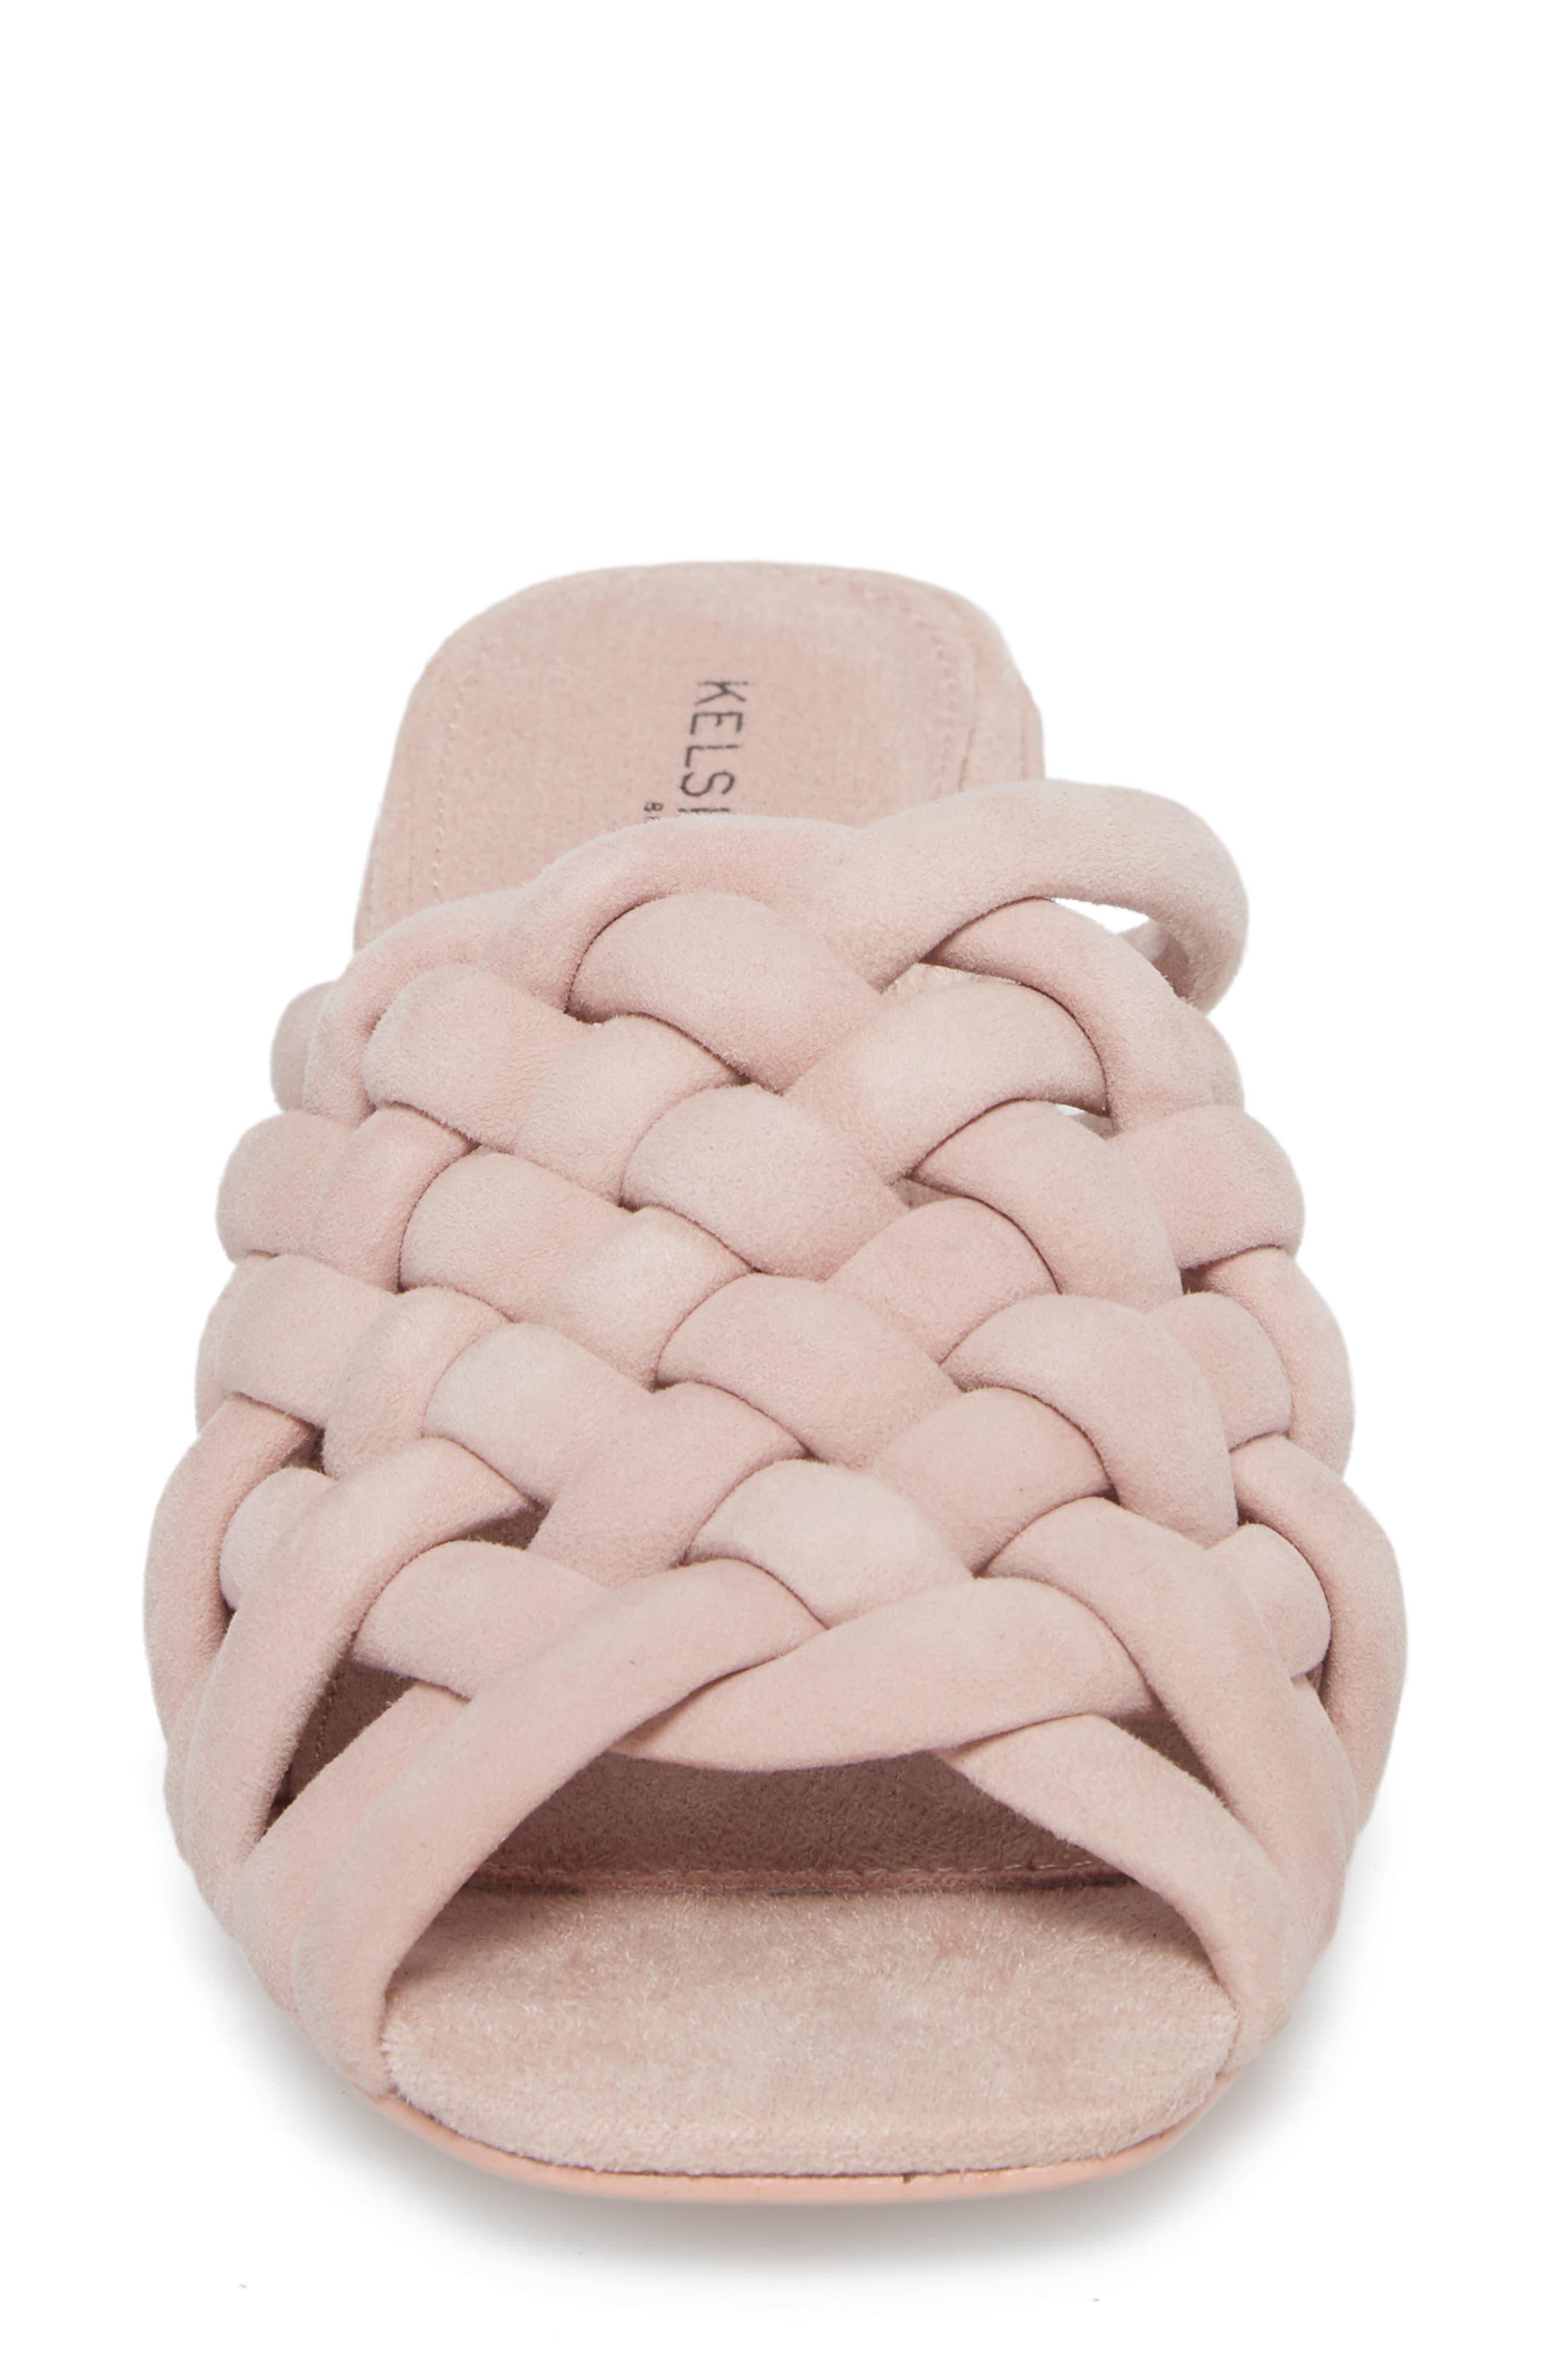 Sky Dress Woven Mule Sandal,                             Alternate thumbnail 4, color,                             Pale Pink